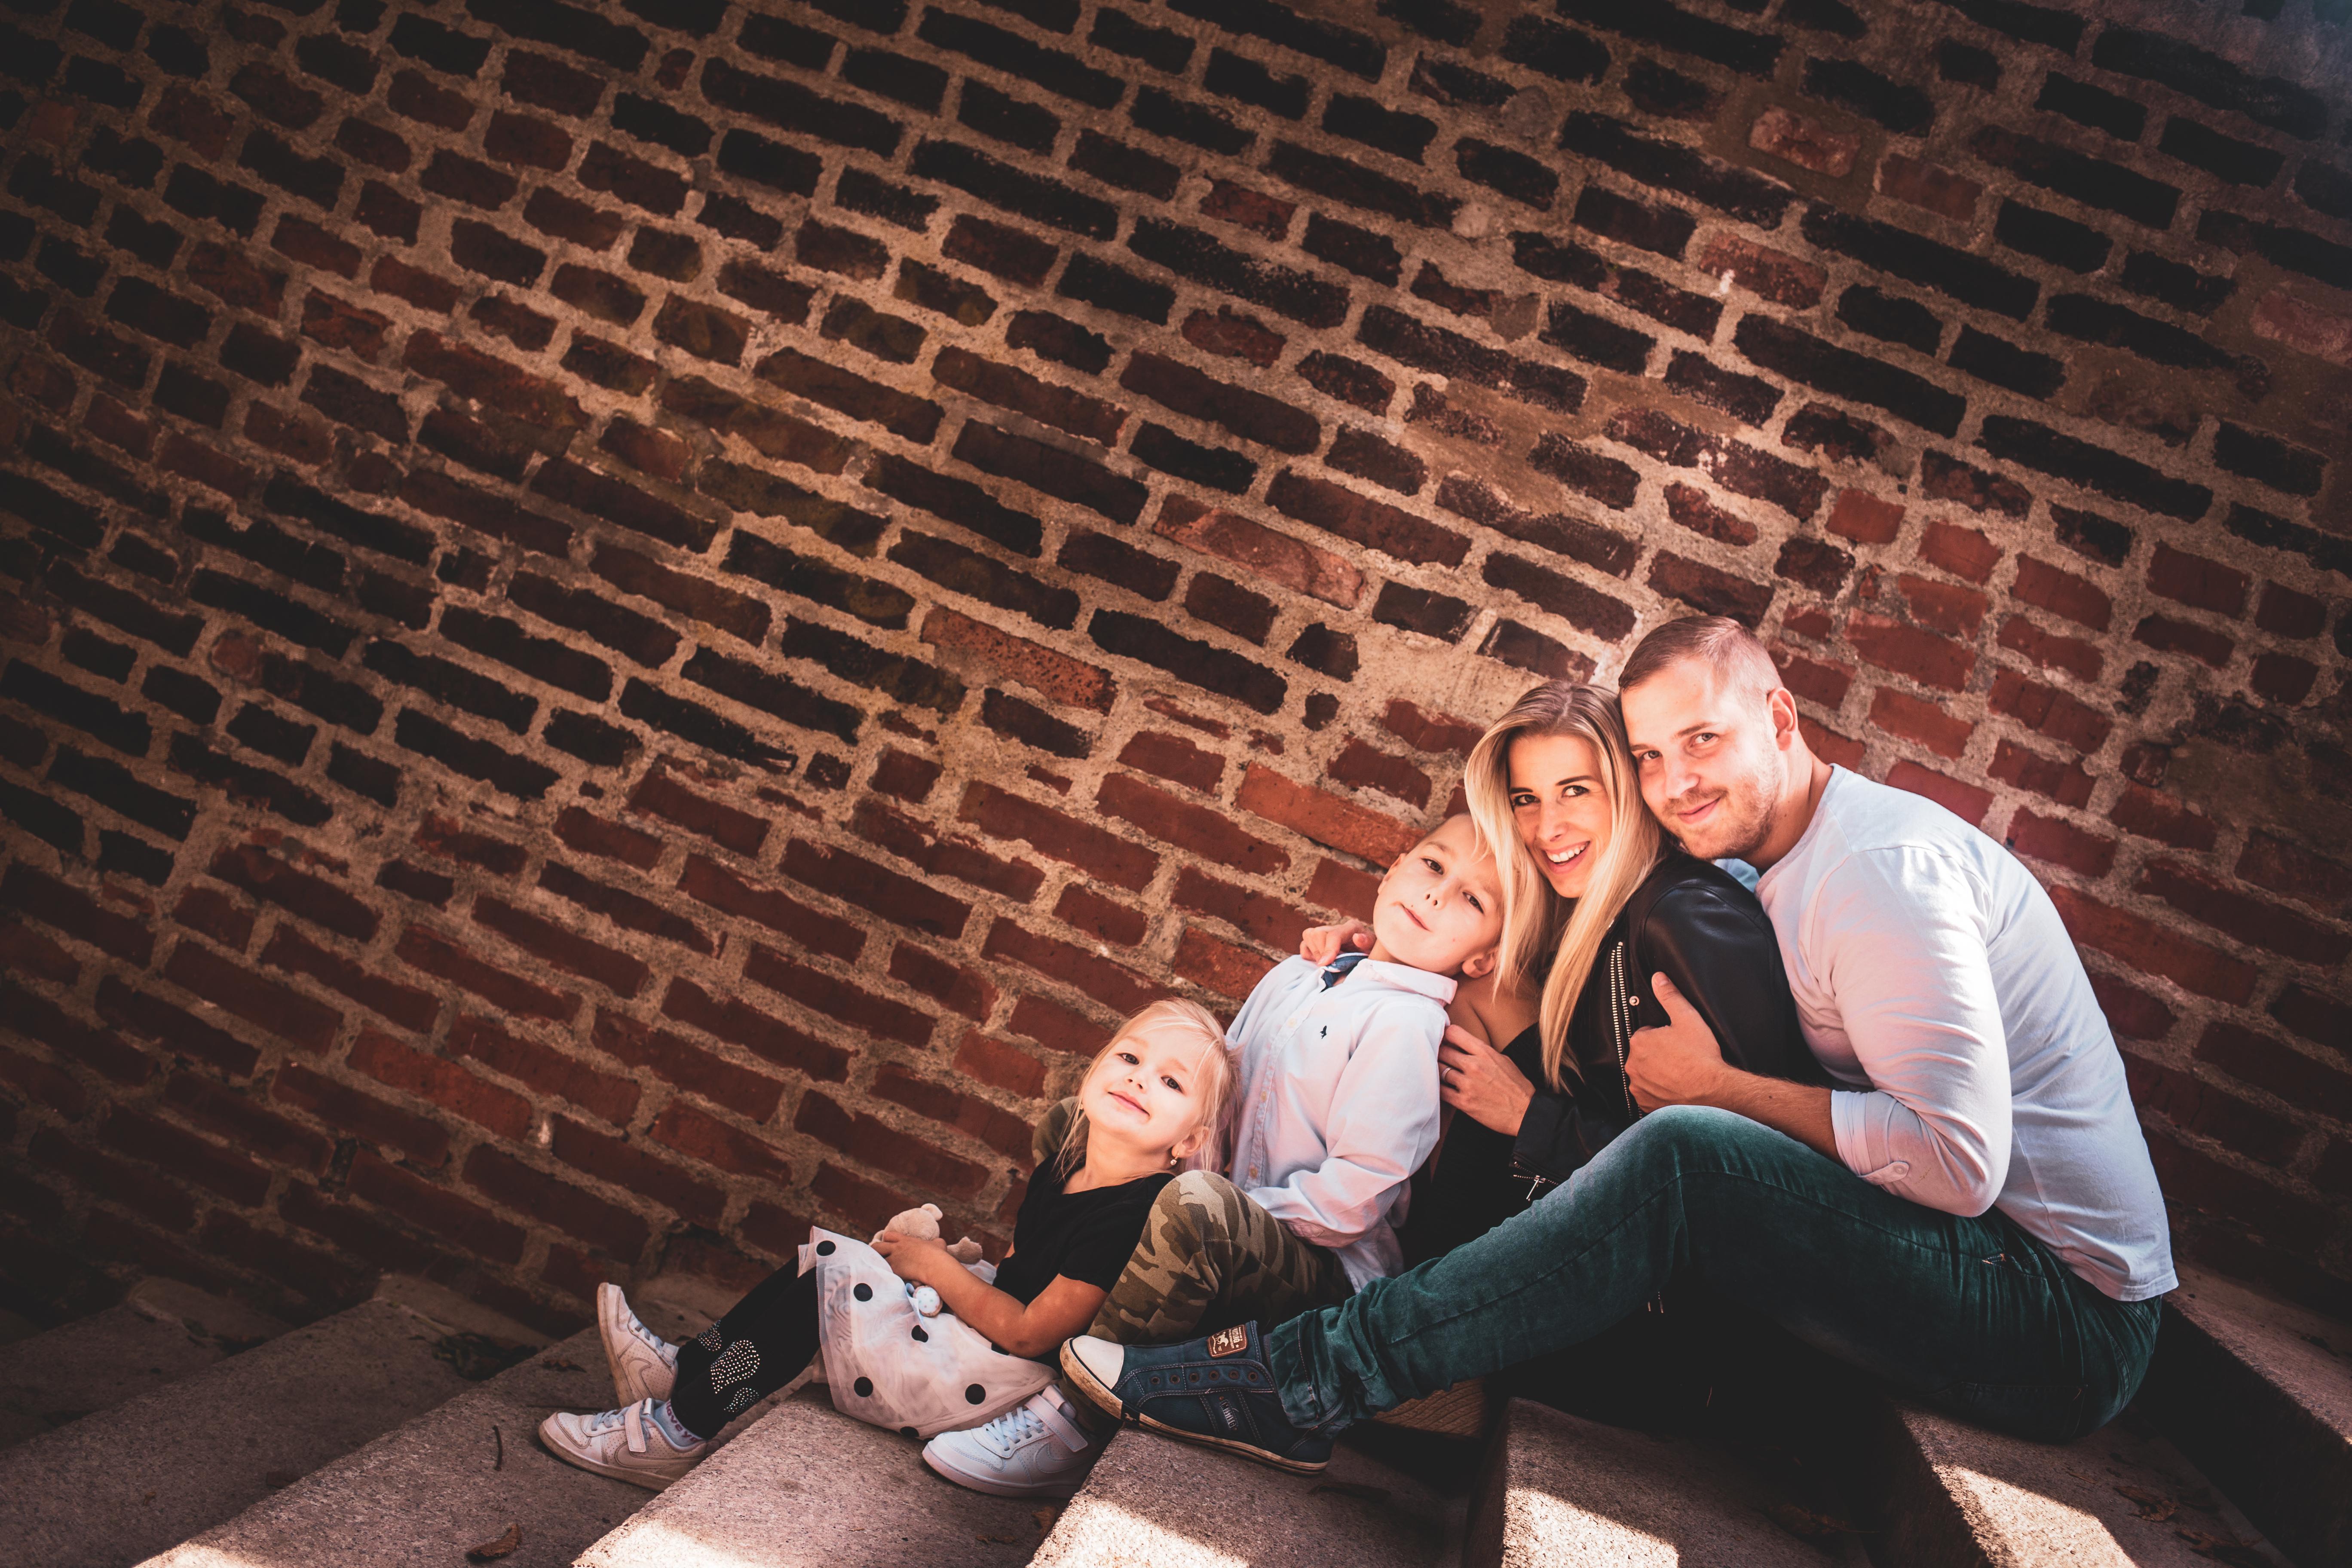 Family photo from Prague